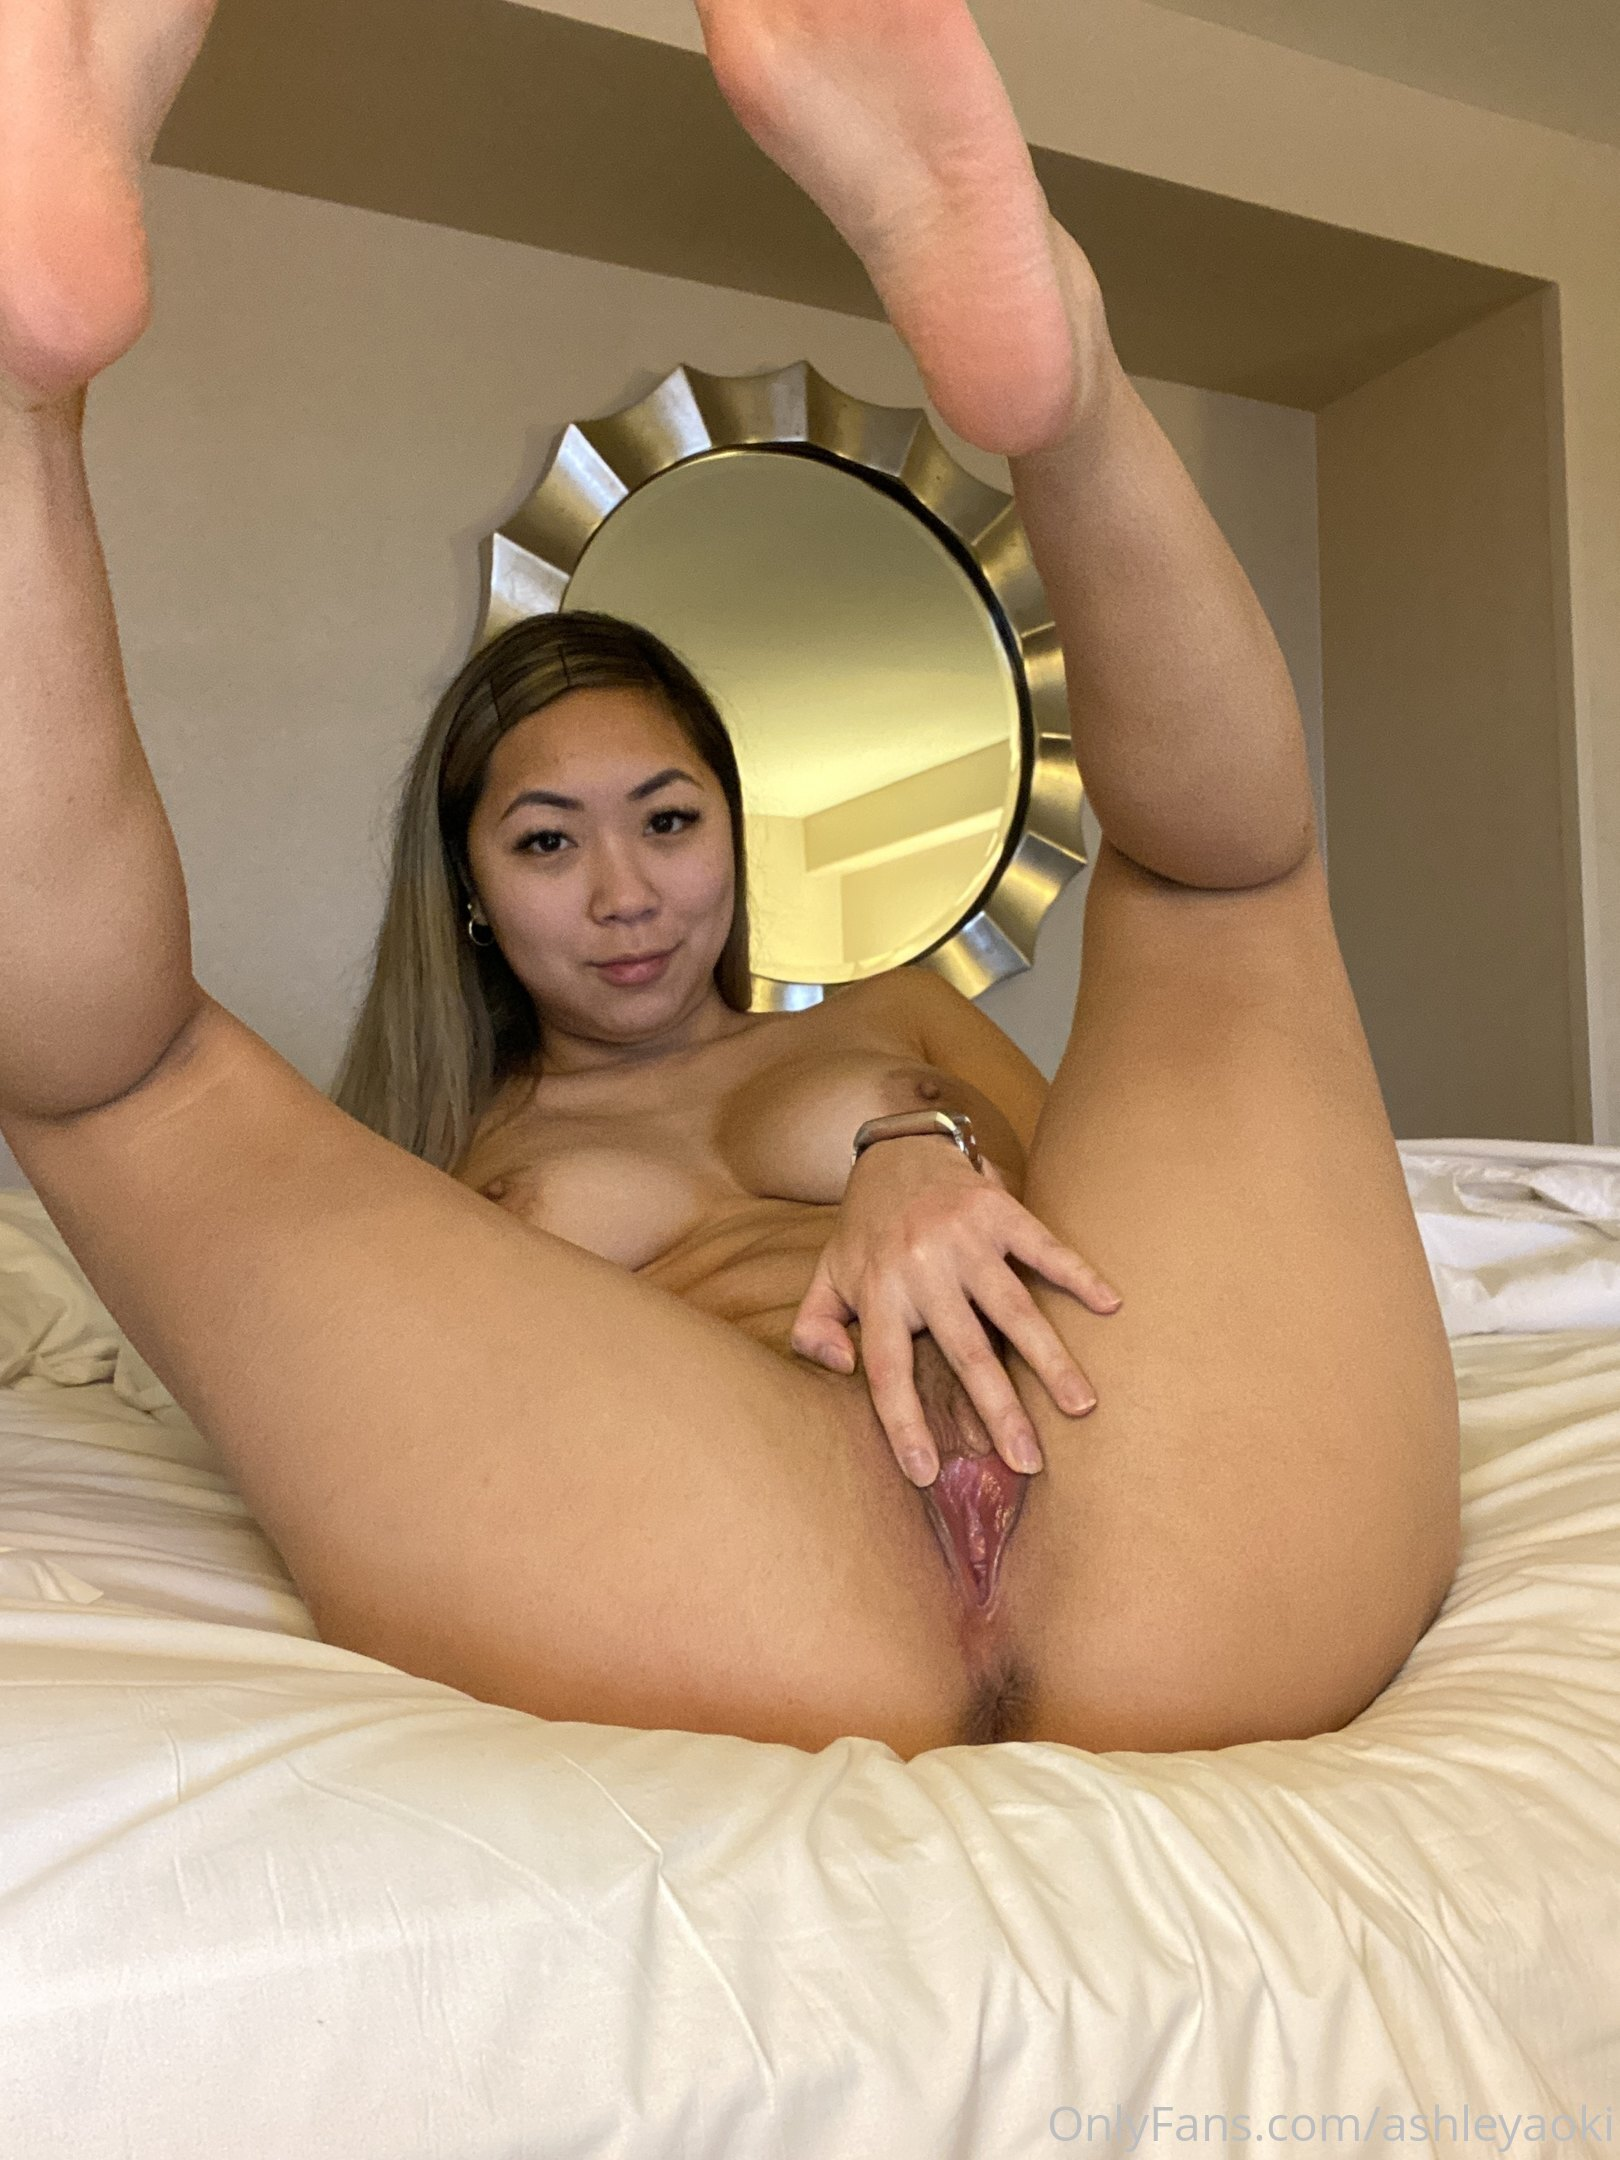 Ashley Aoki, Ashleyaoki, Onlyfans Leaks 0257